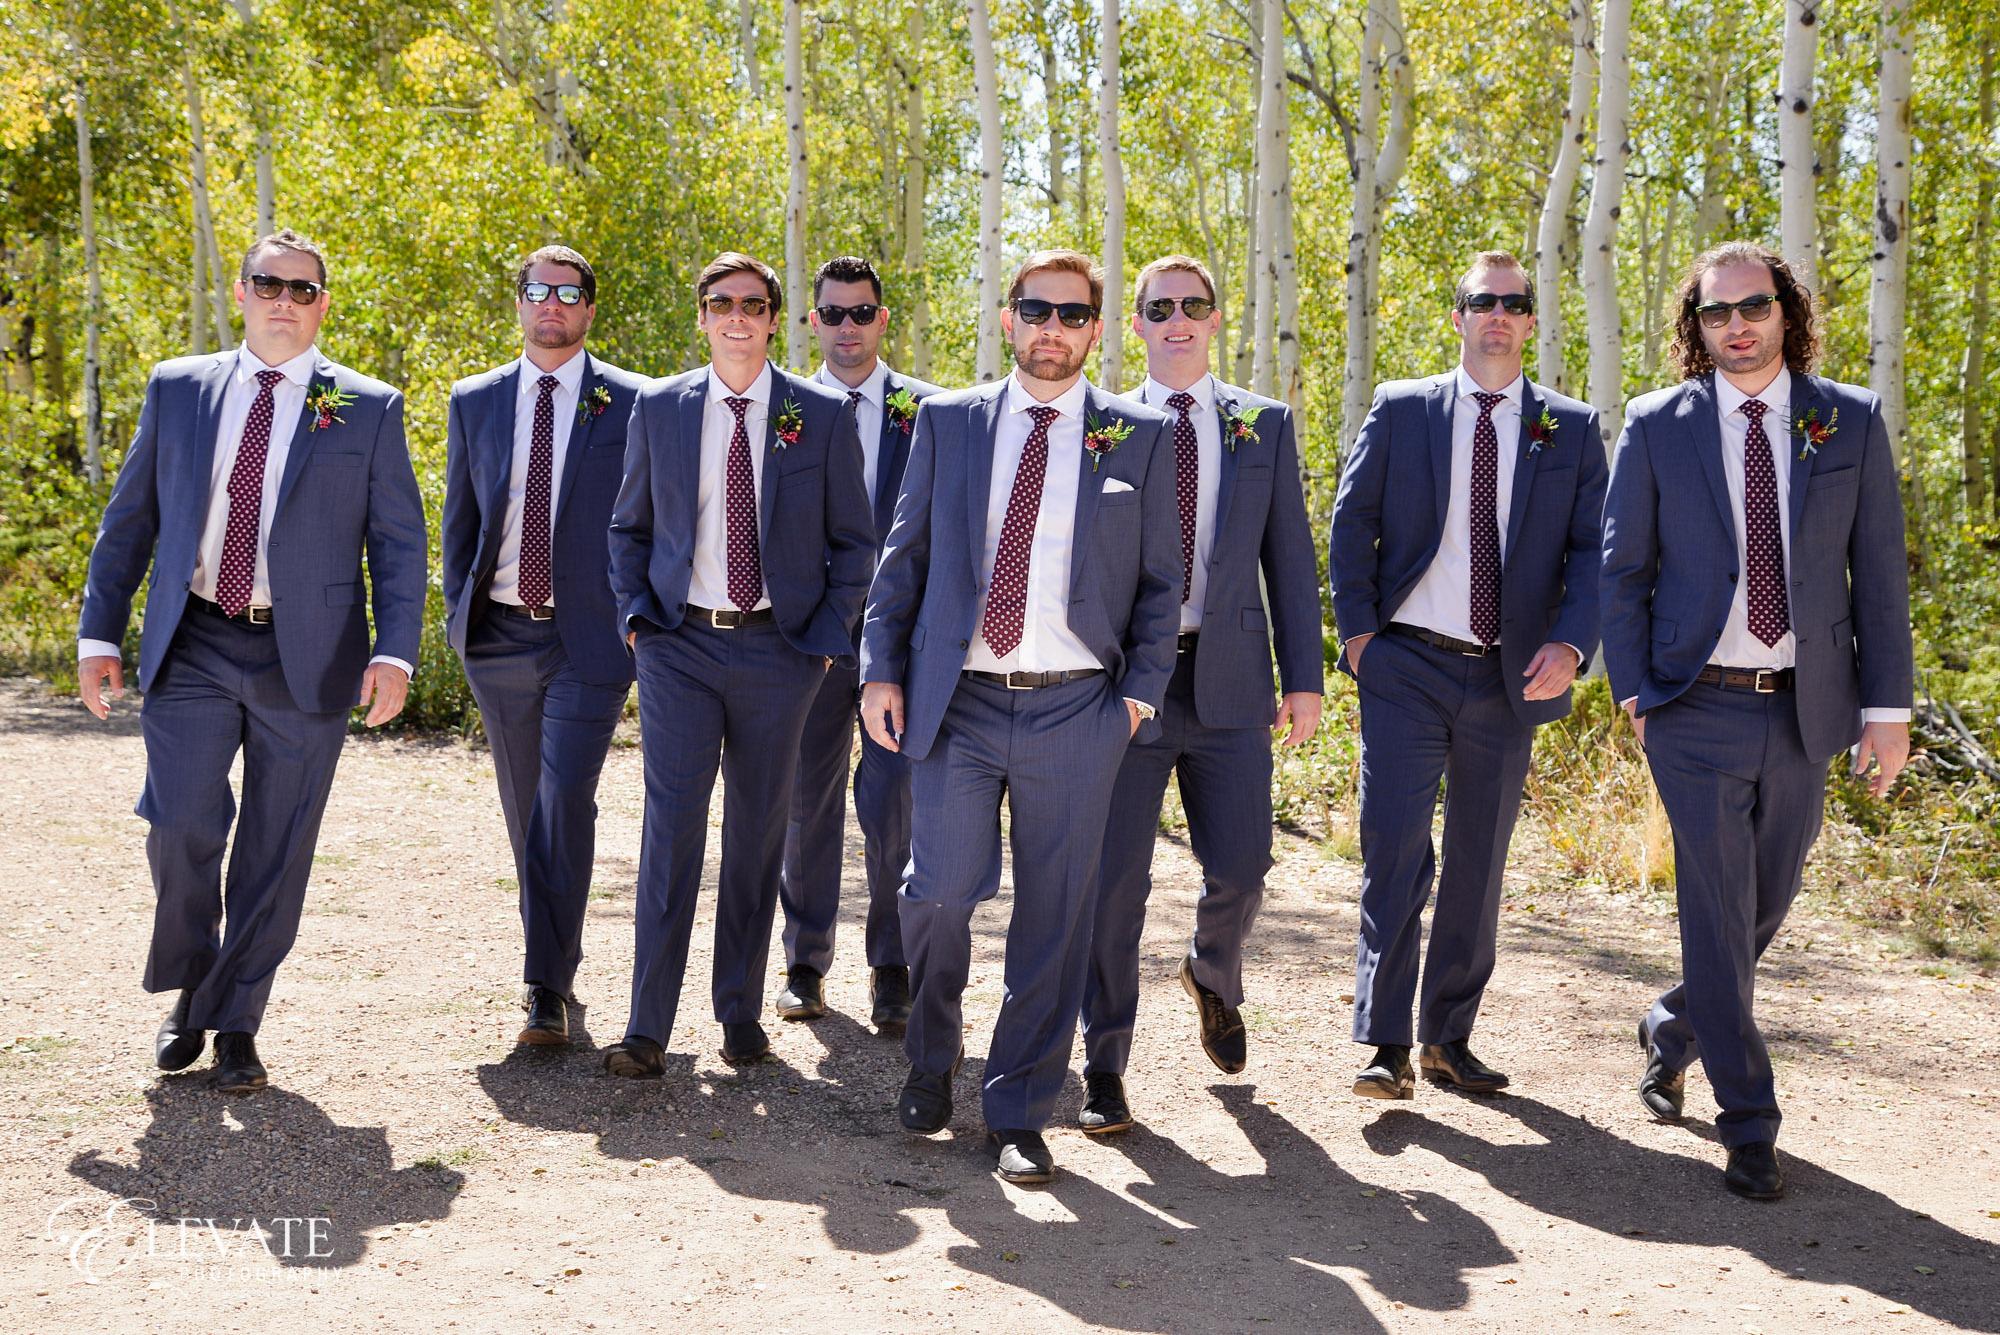 groomsmen sunglasses blue suits